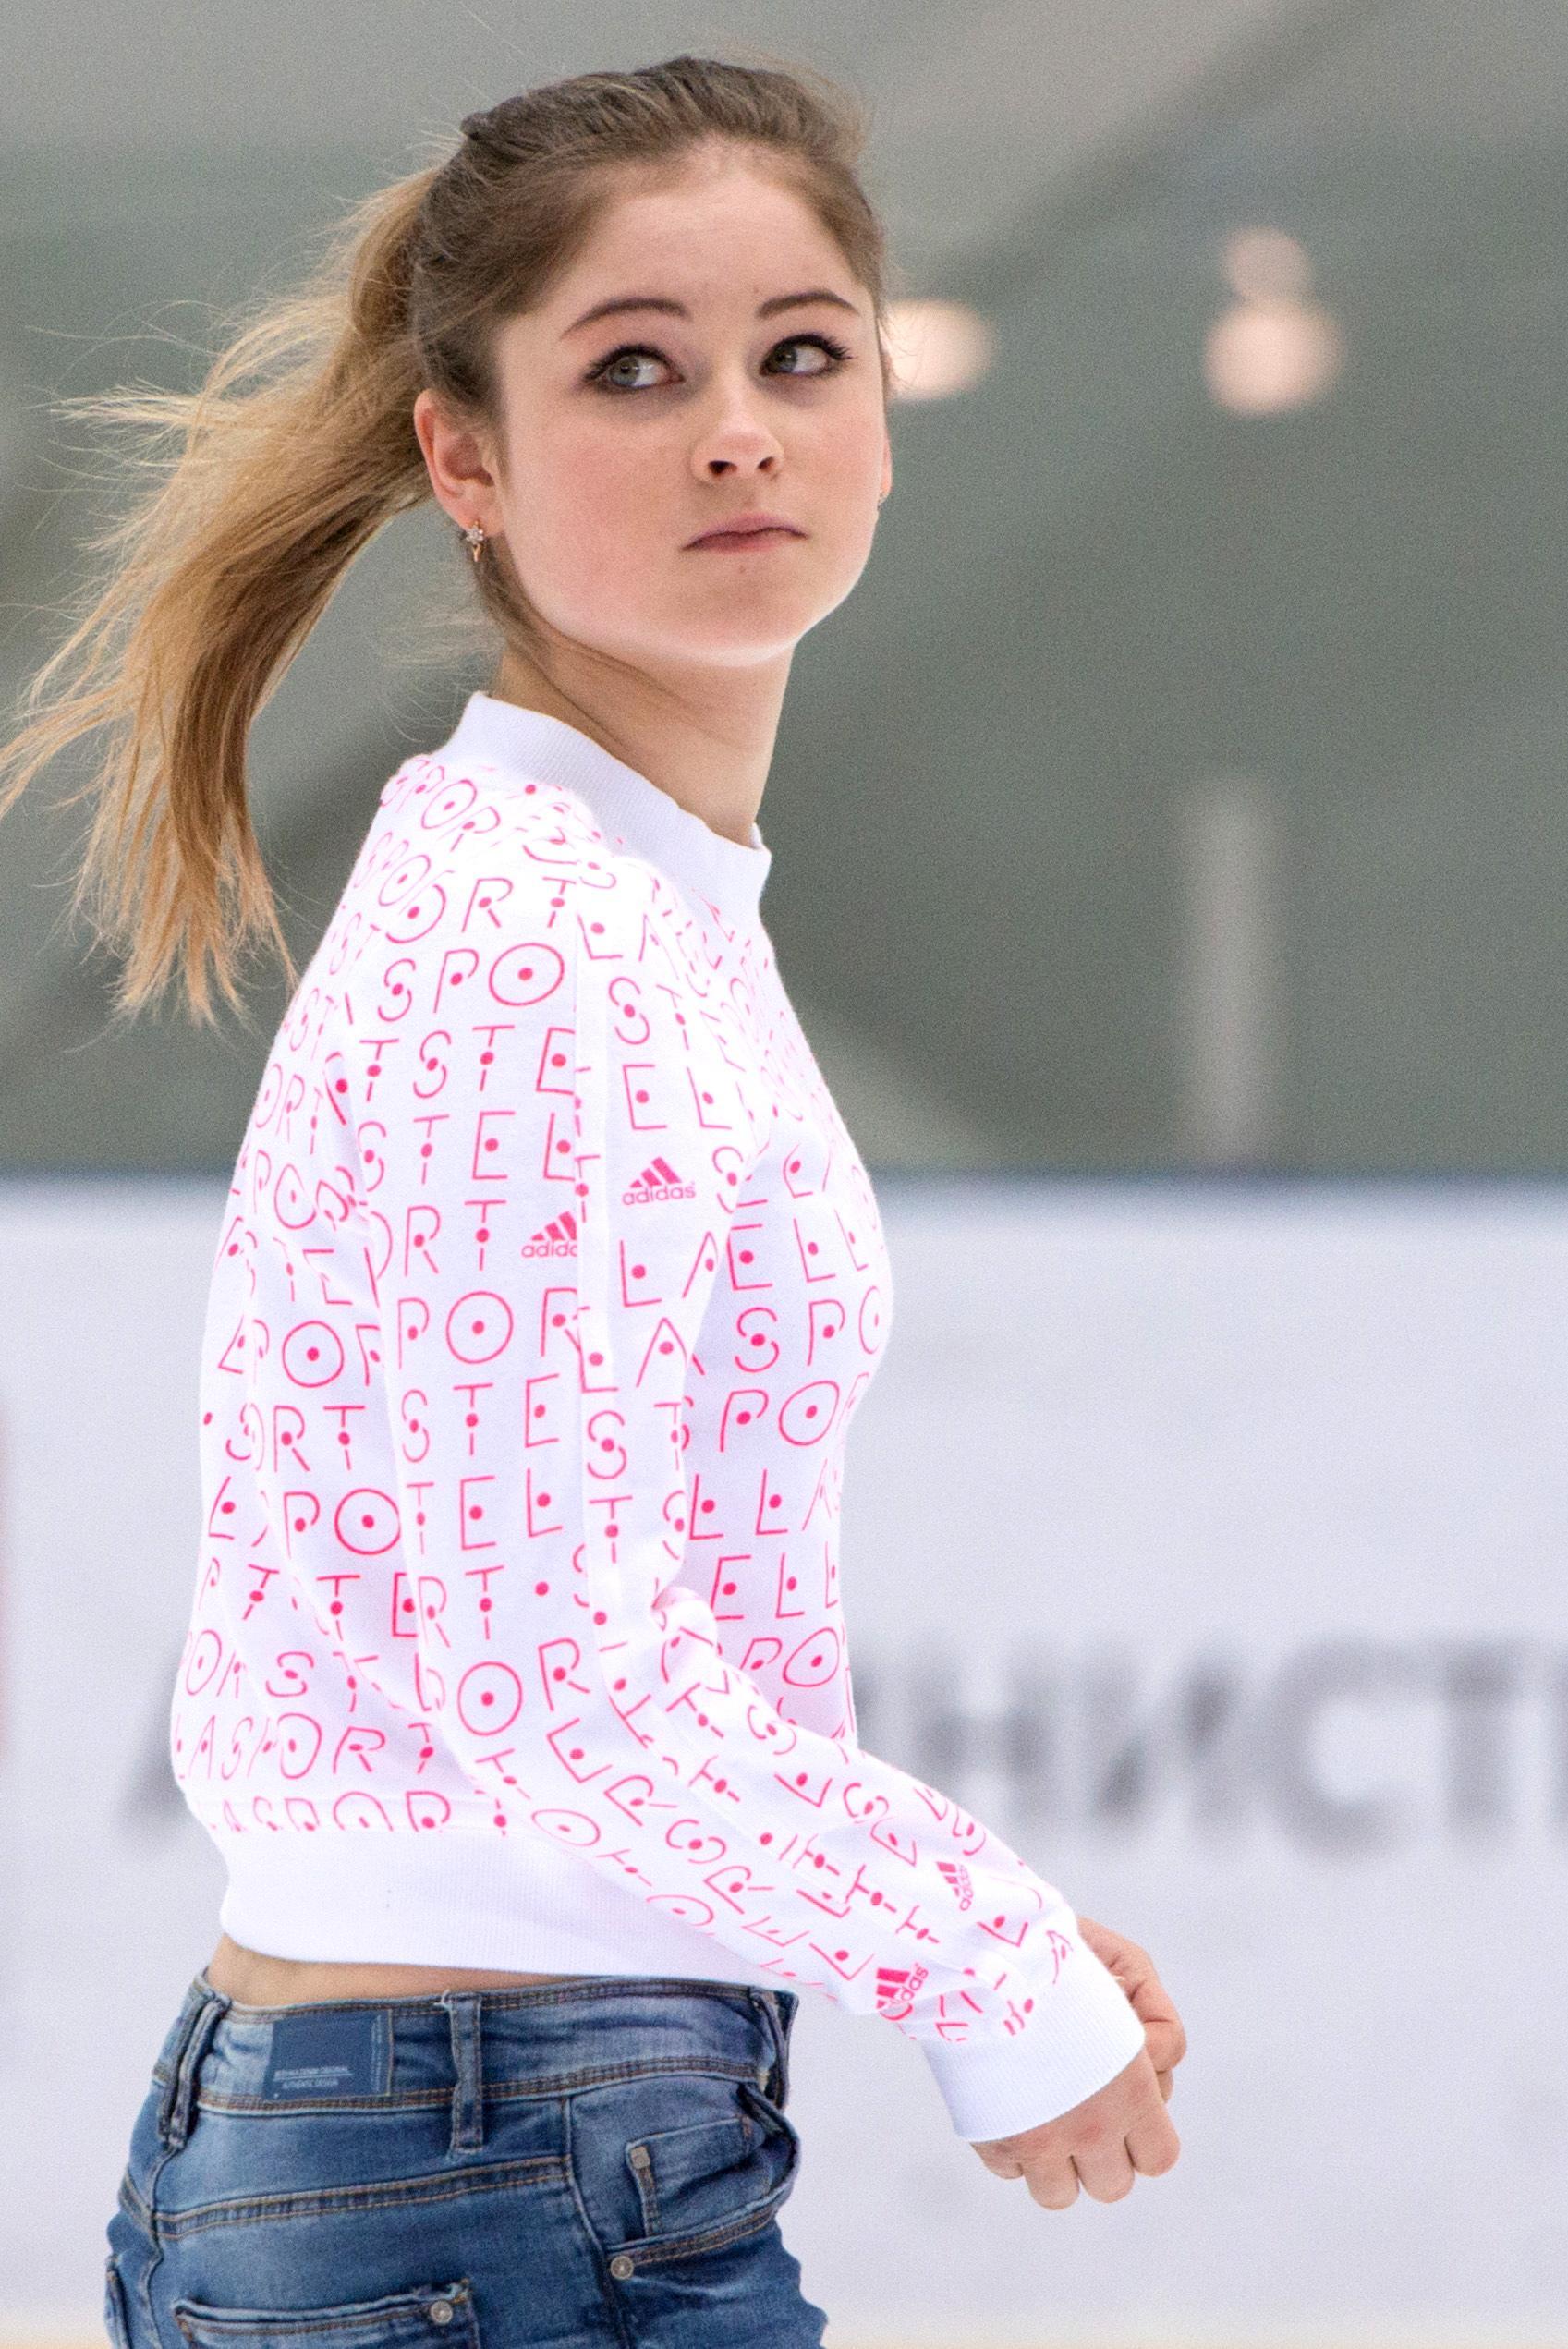 Фото © ТАСС / Артур Лебедев